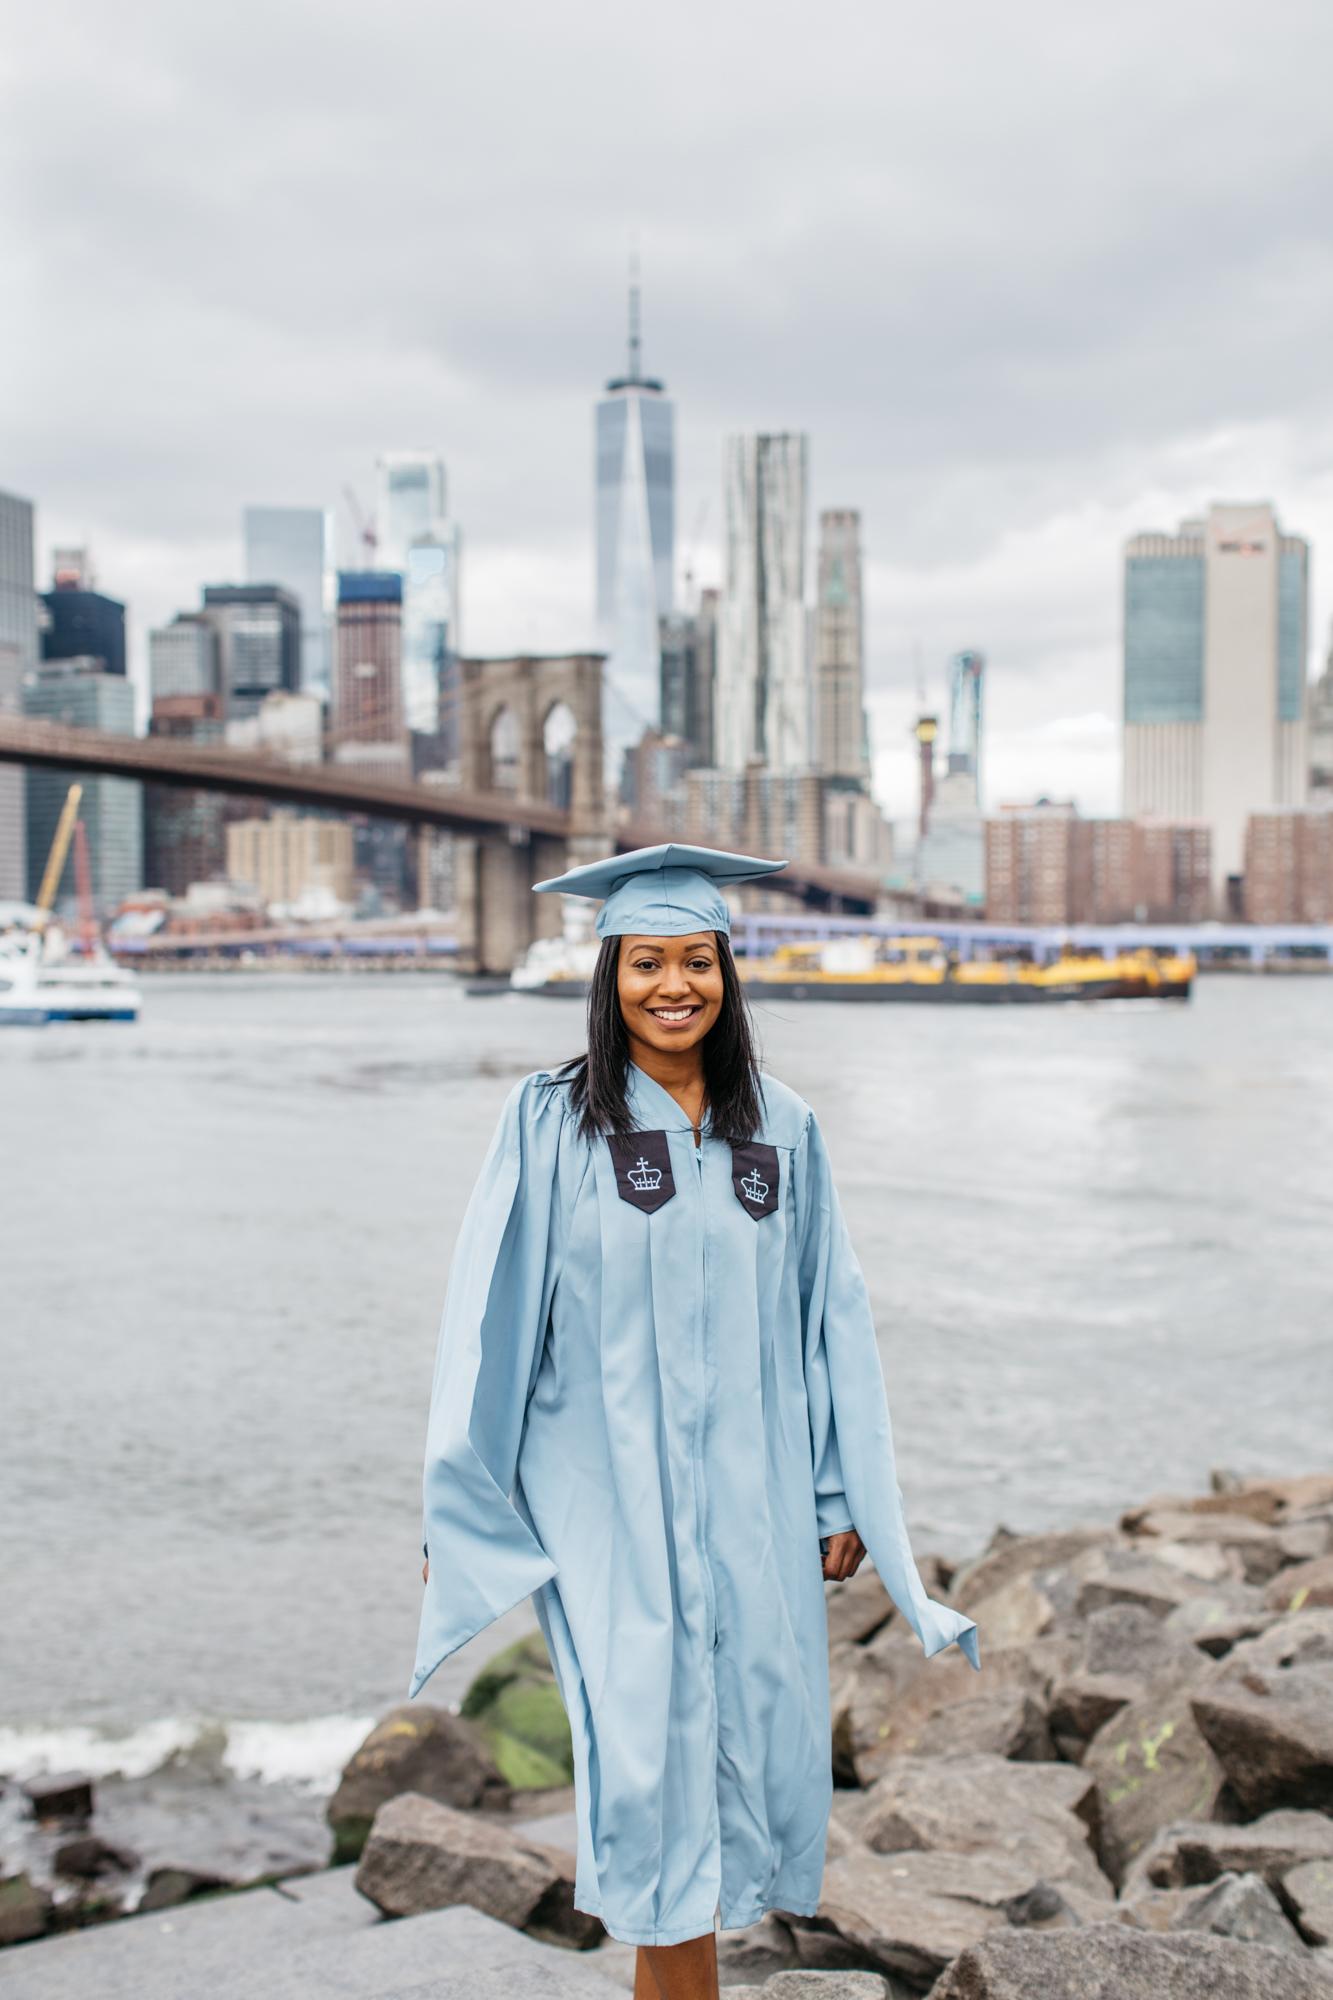 Courtney_Graduation_Photographer_Colombia_MBA_Student_DUMBO_portrait_NYC_Brooklyn-226.jpg